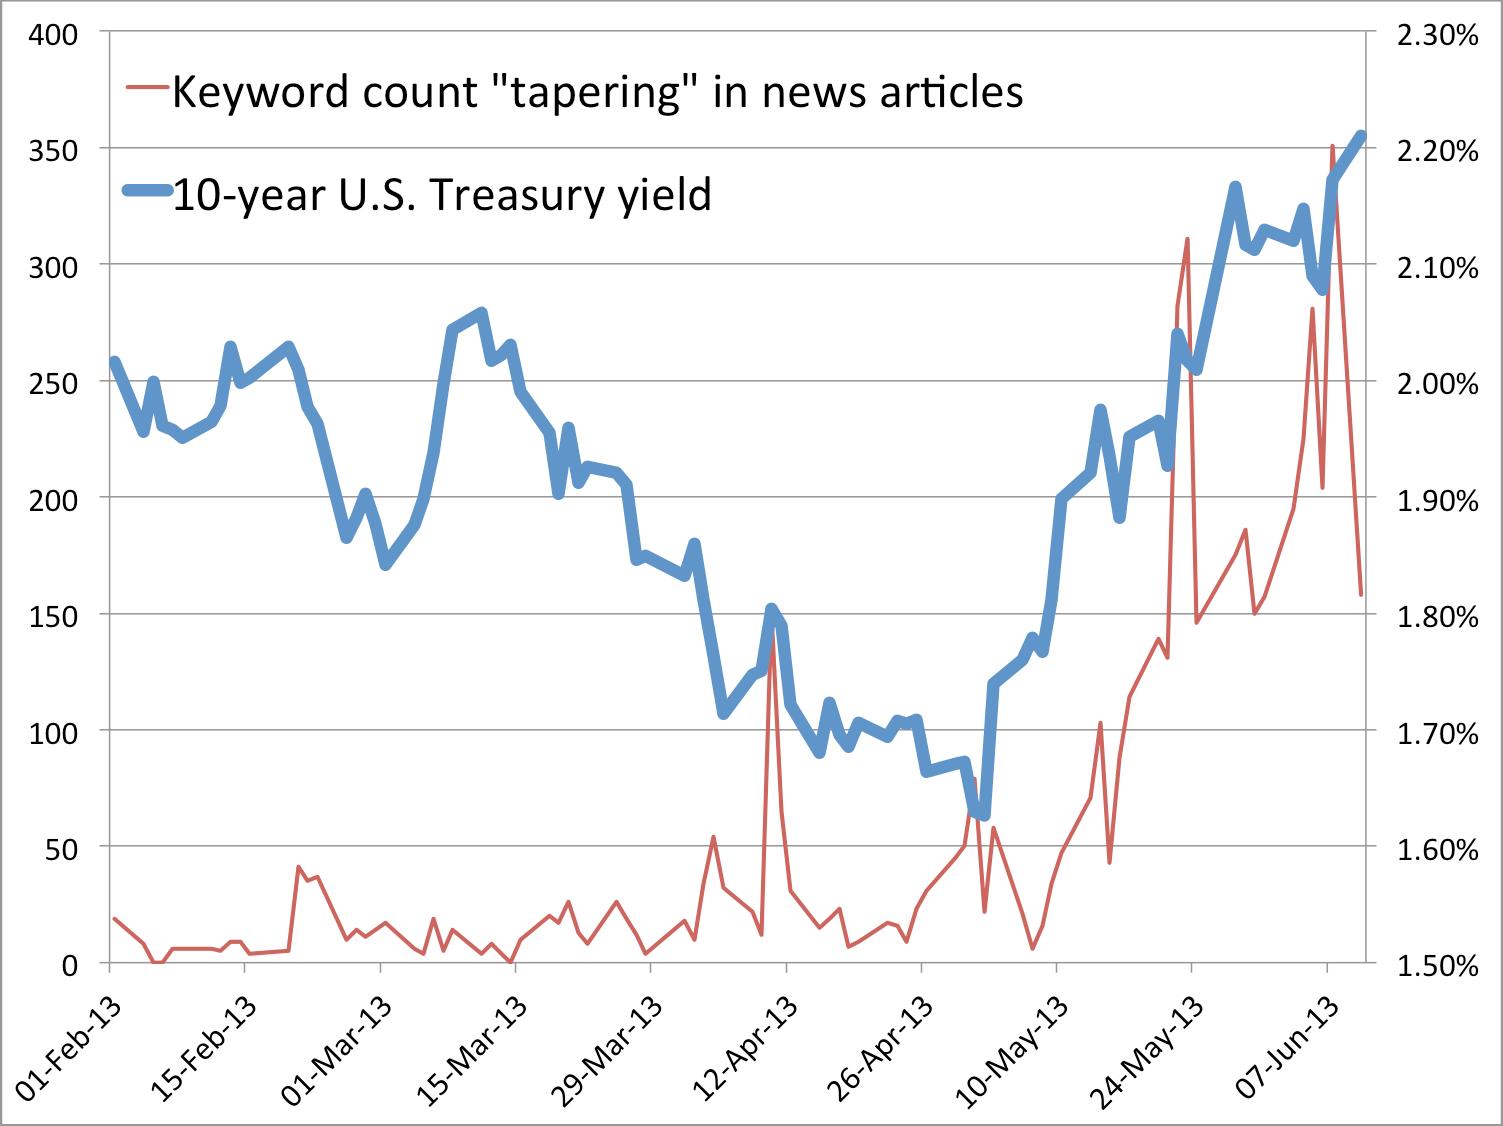 tapering keyword count